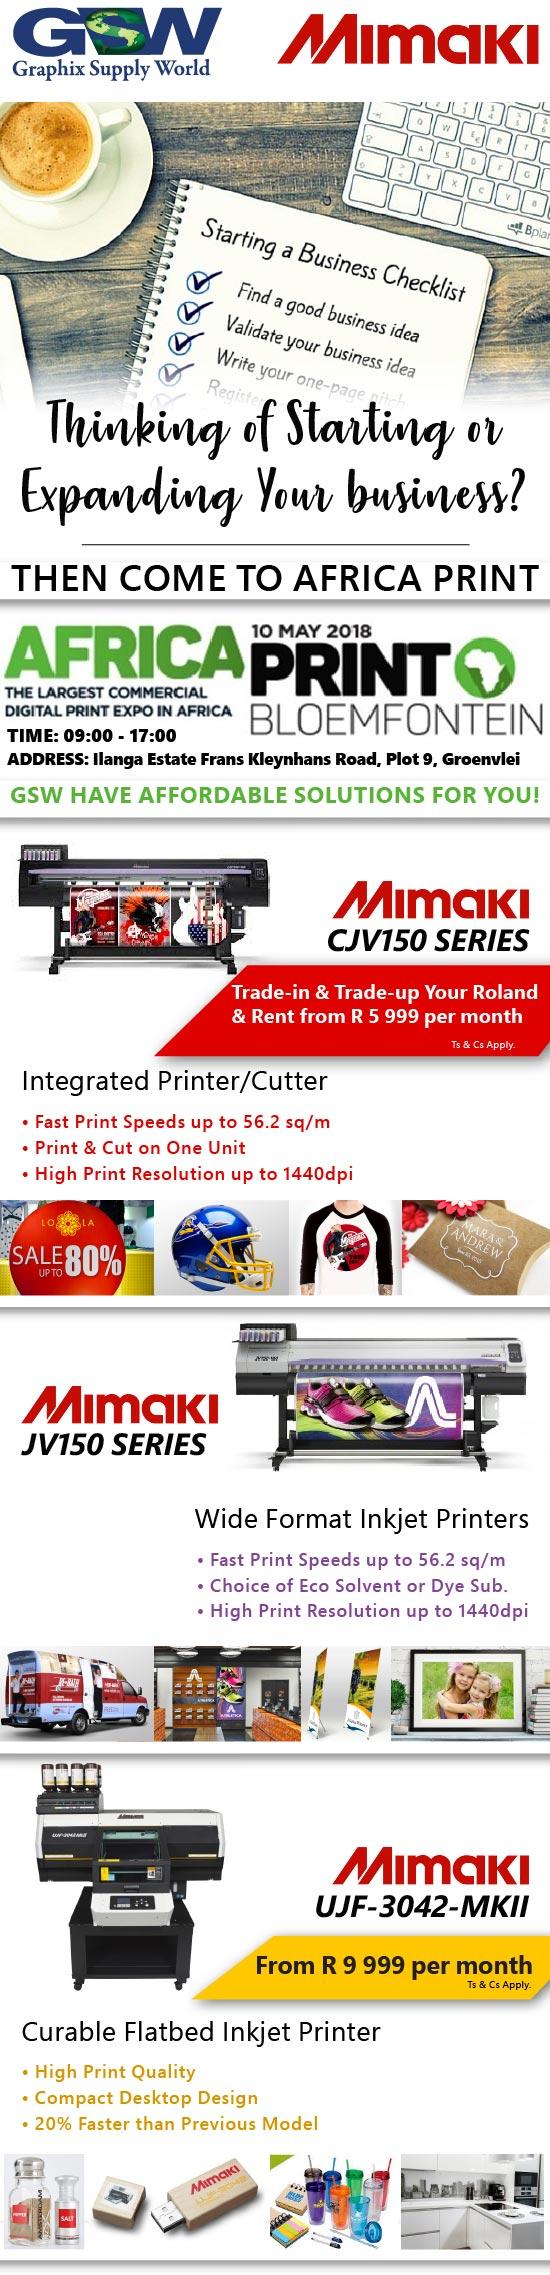 Events & Shows - GSW - Graphix Supply World - Mimaki Printers